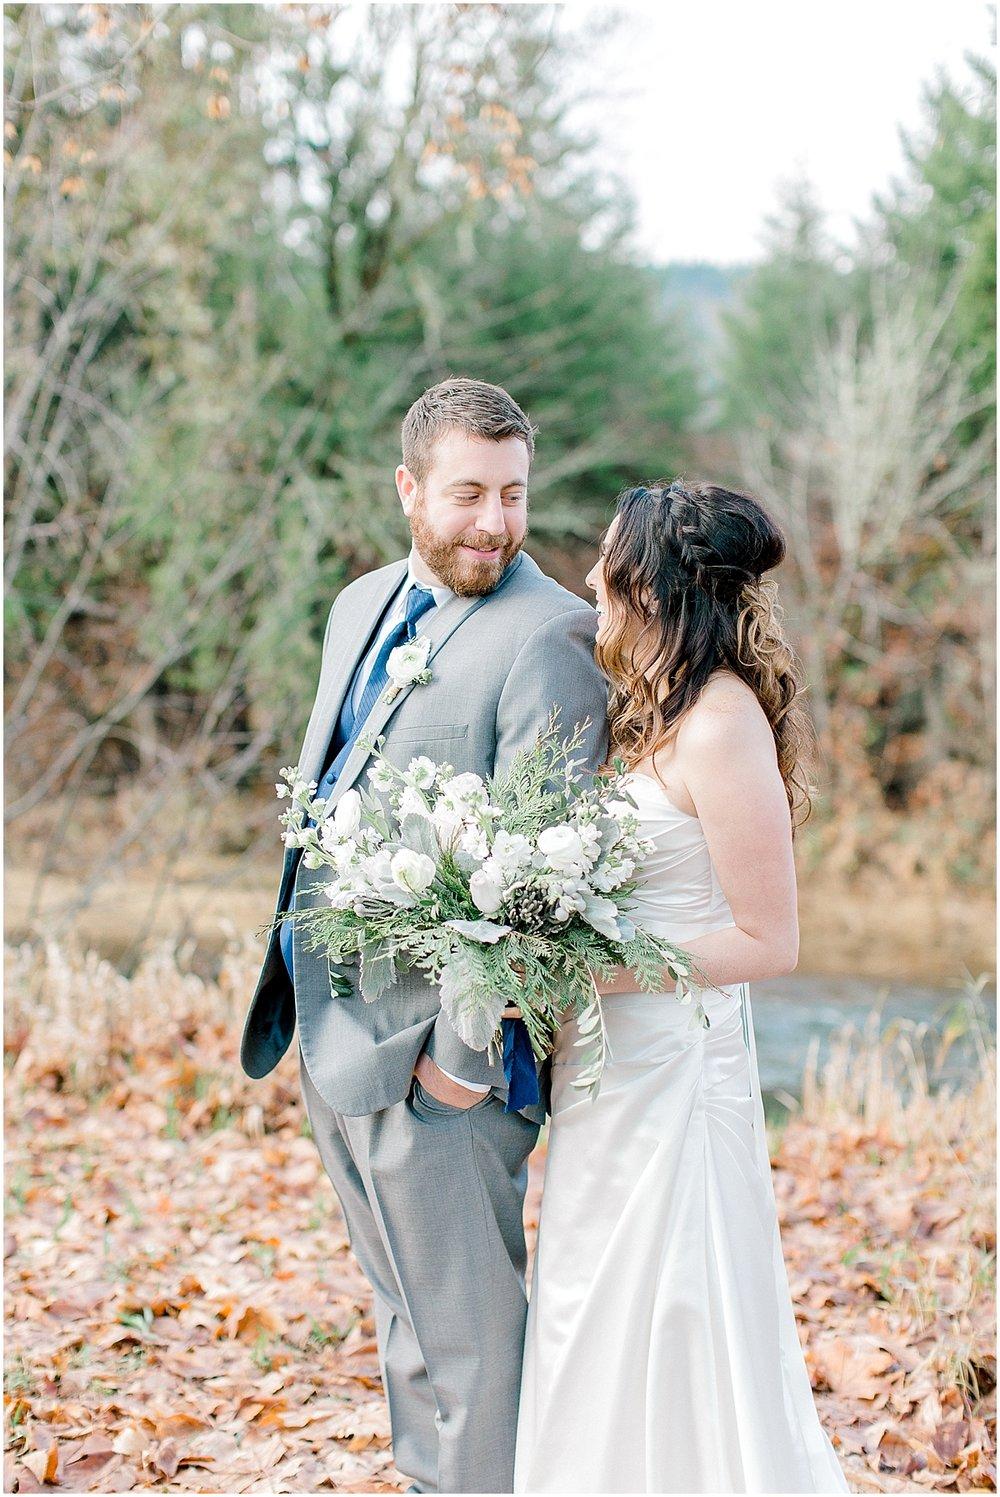 Chehalis Washington Winter Wedding Silver and White | Willapa Hills Farm Wedding | Eastham | Emma Rose Company PNW Light and Airy Wedding Photographer_0022.jpg